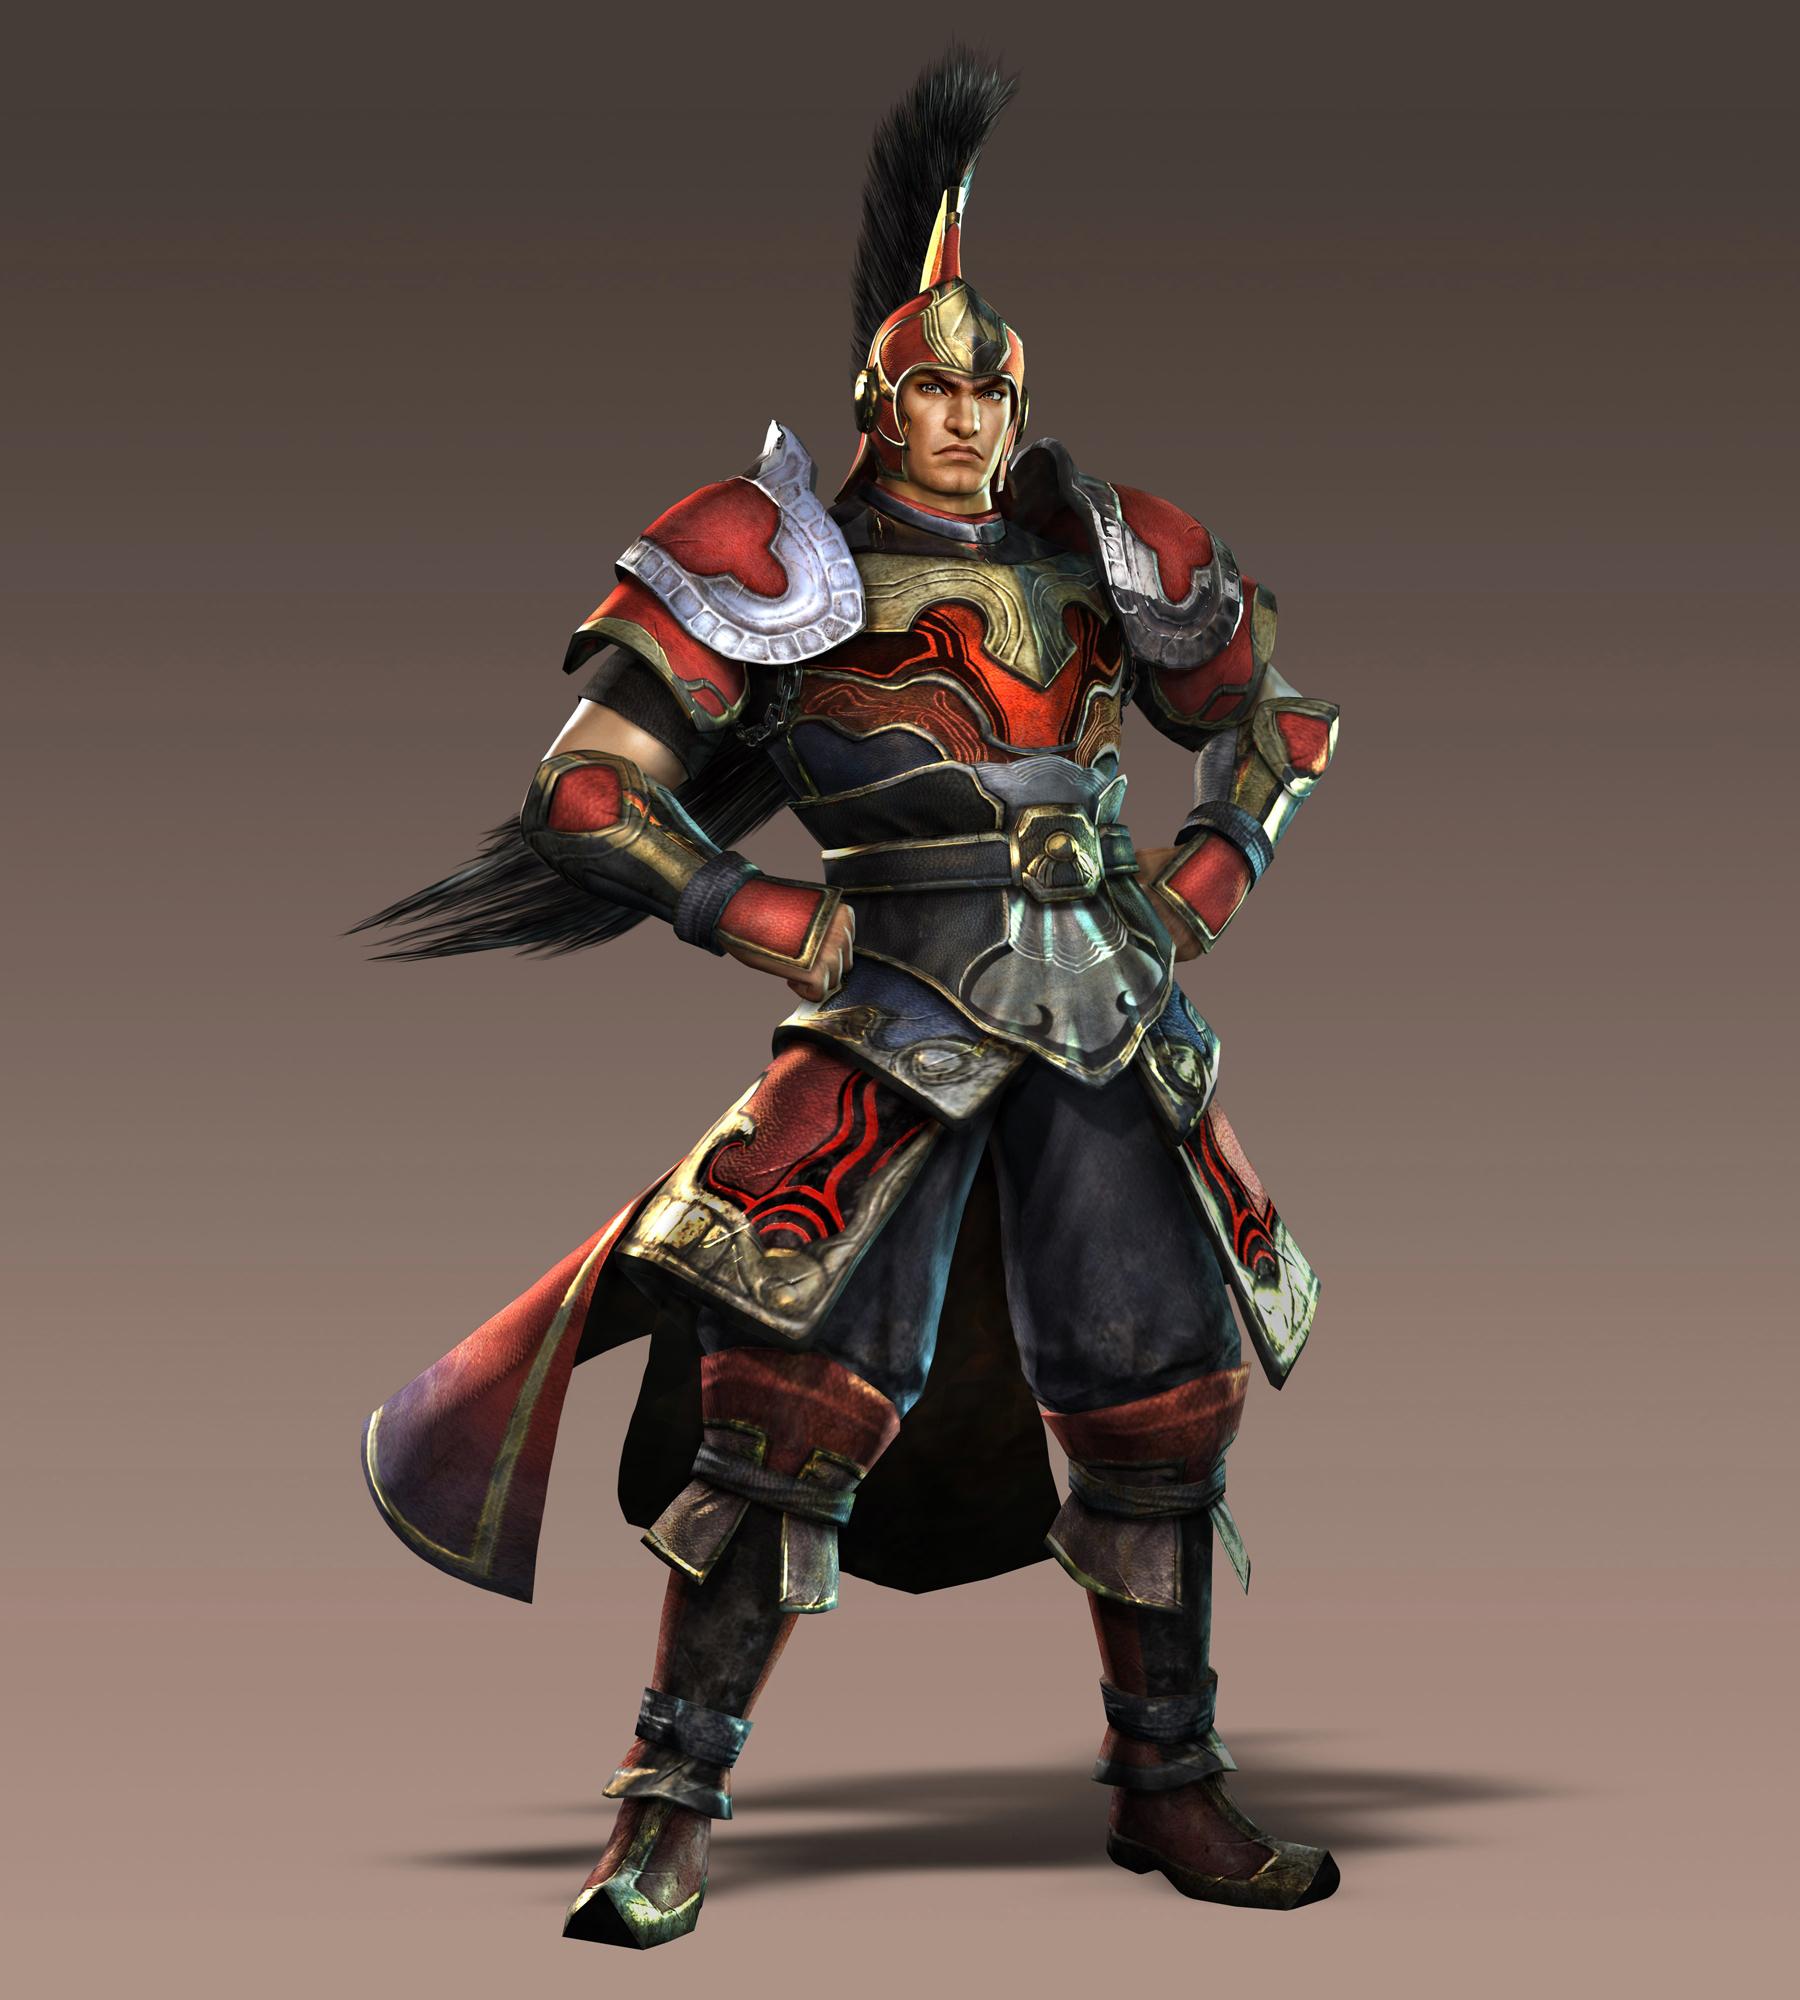 Warriors Orochi 3 Lian Shi: Personajes Dynasty Warriors 7